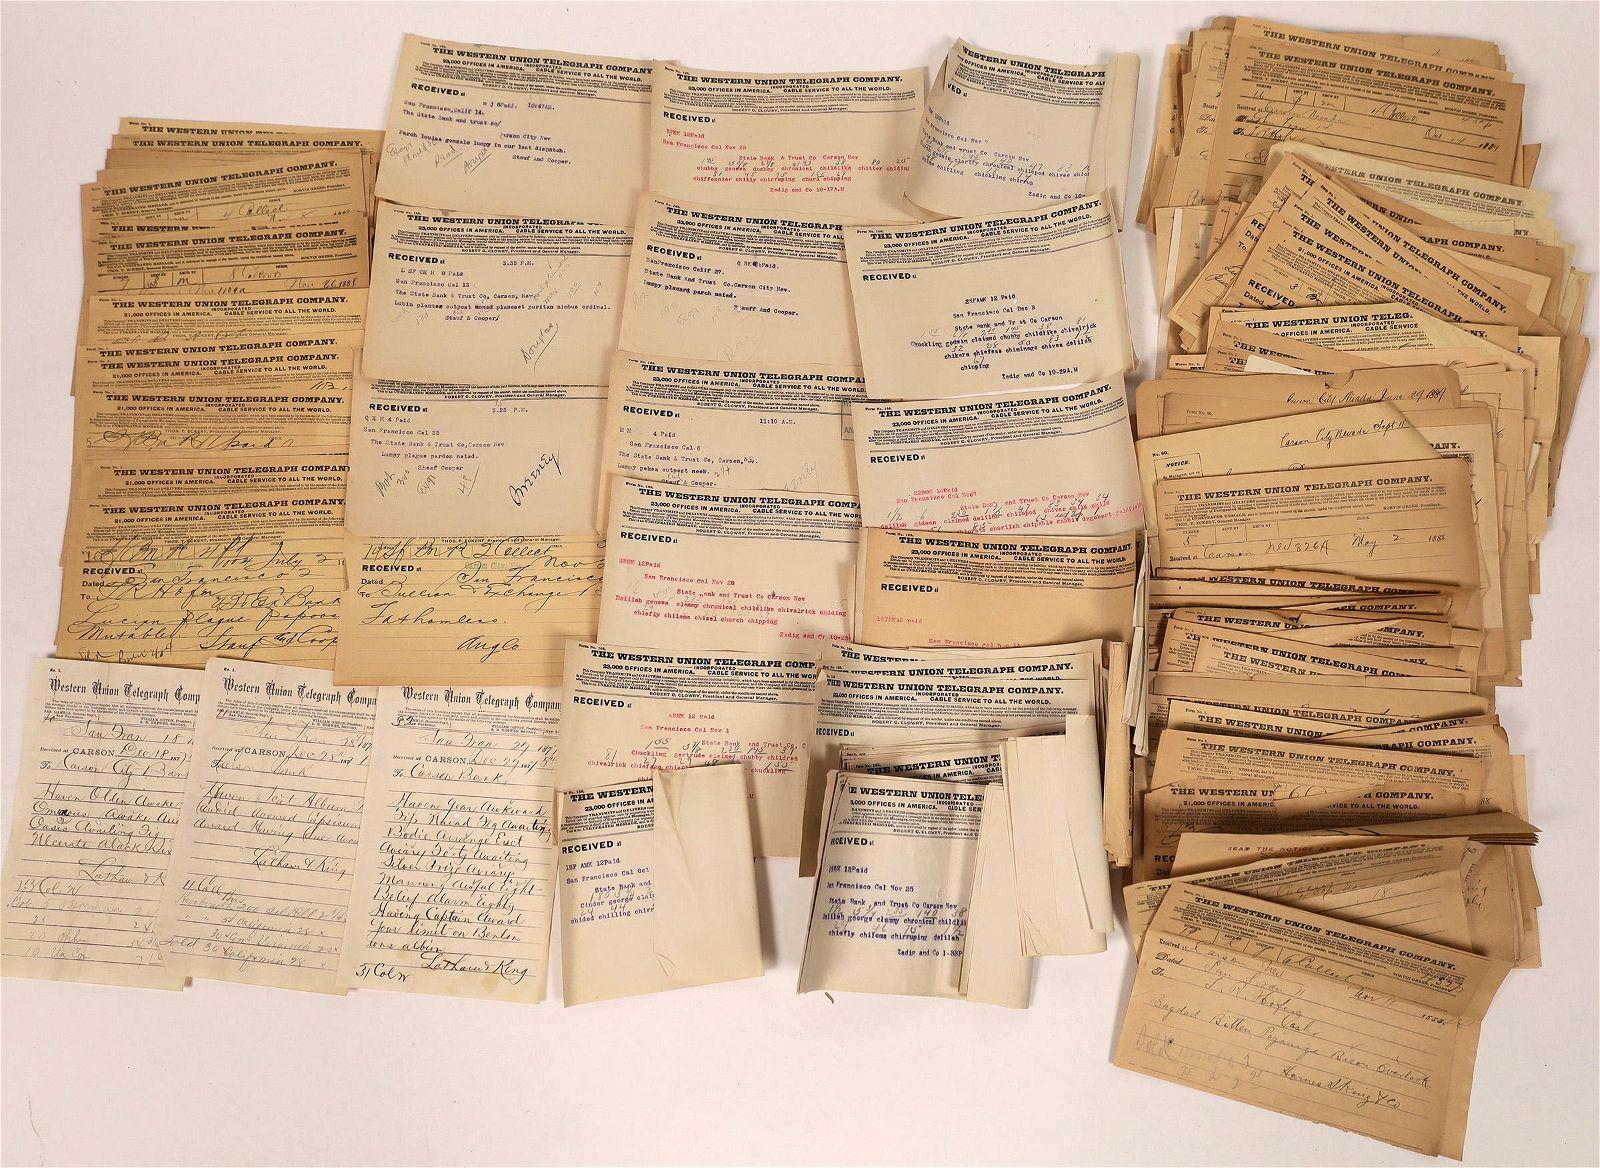 Western Mining Telegram Archive c1875-1905 [135032]